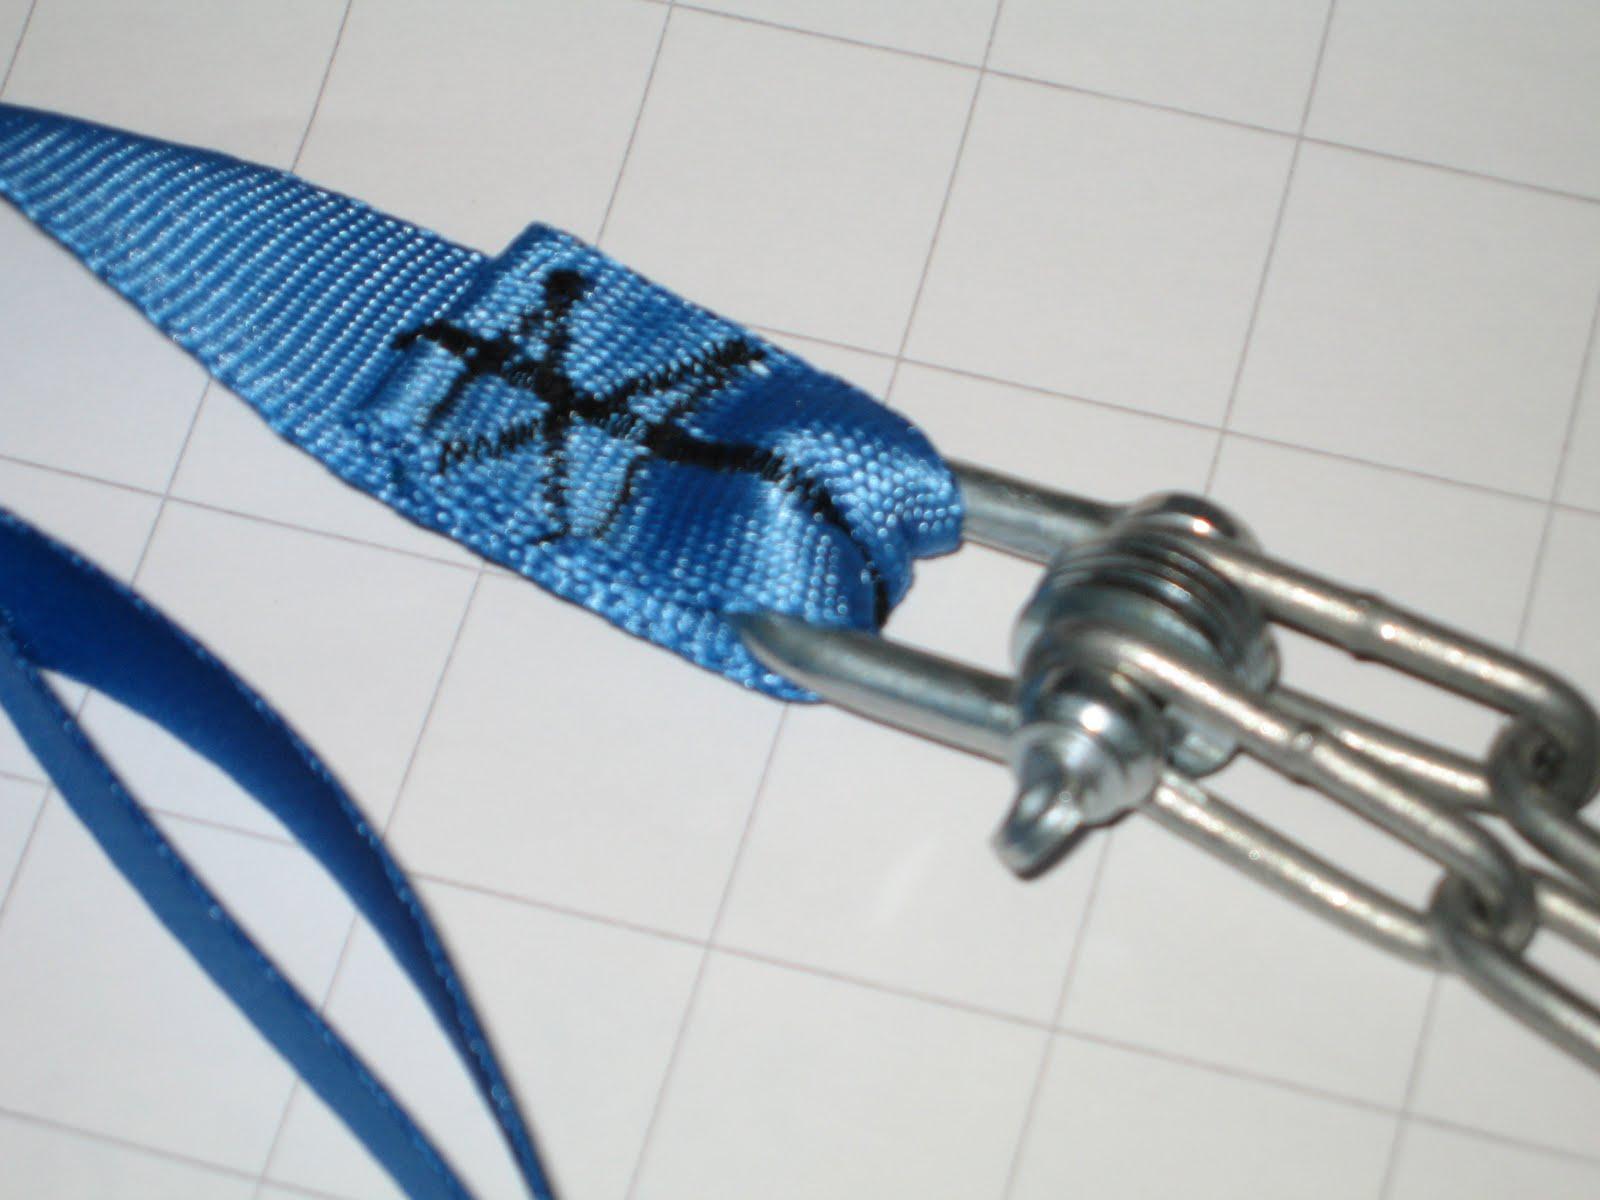 Вышивка бисером на воротник 11